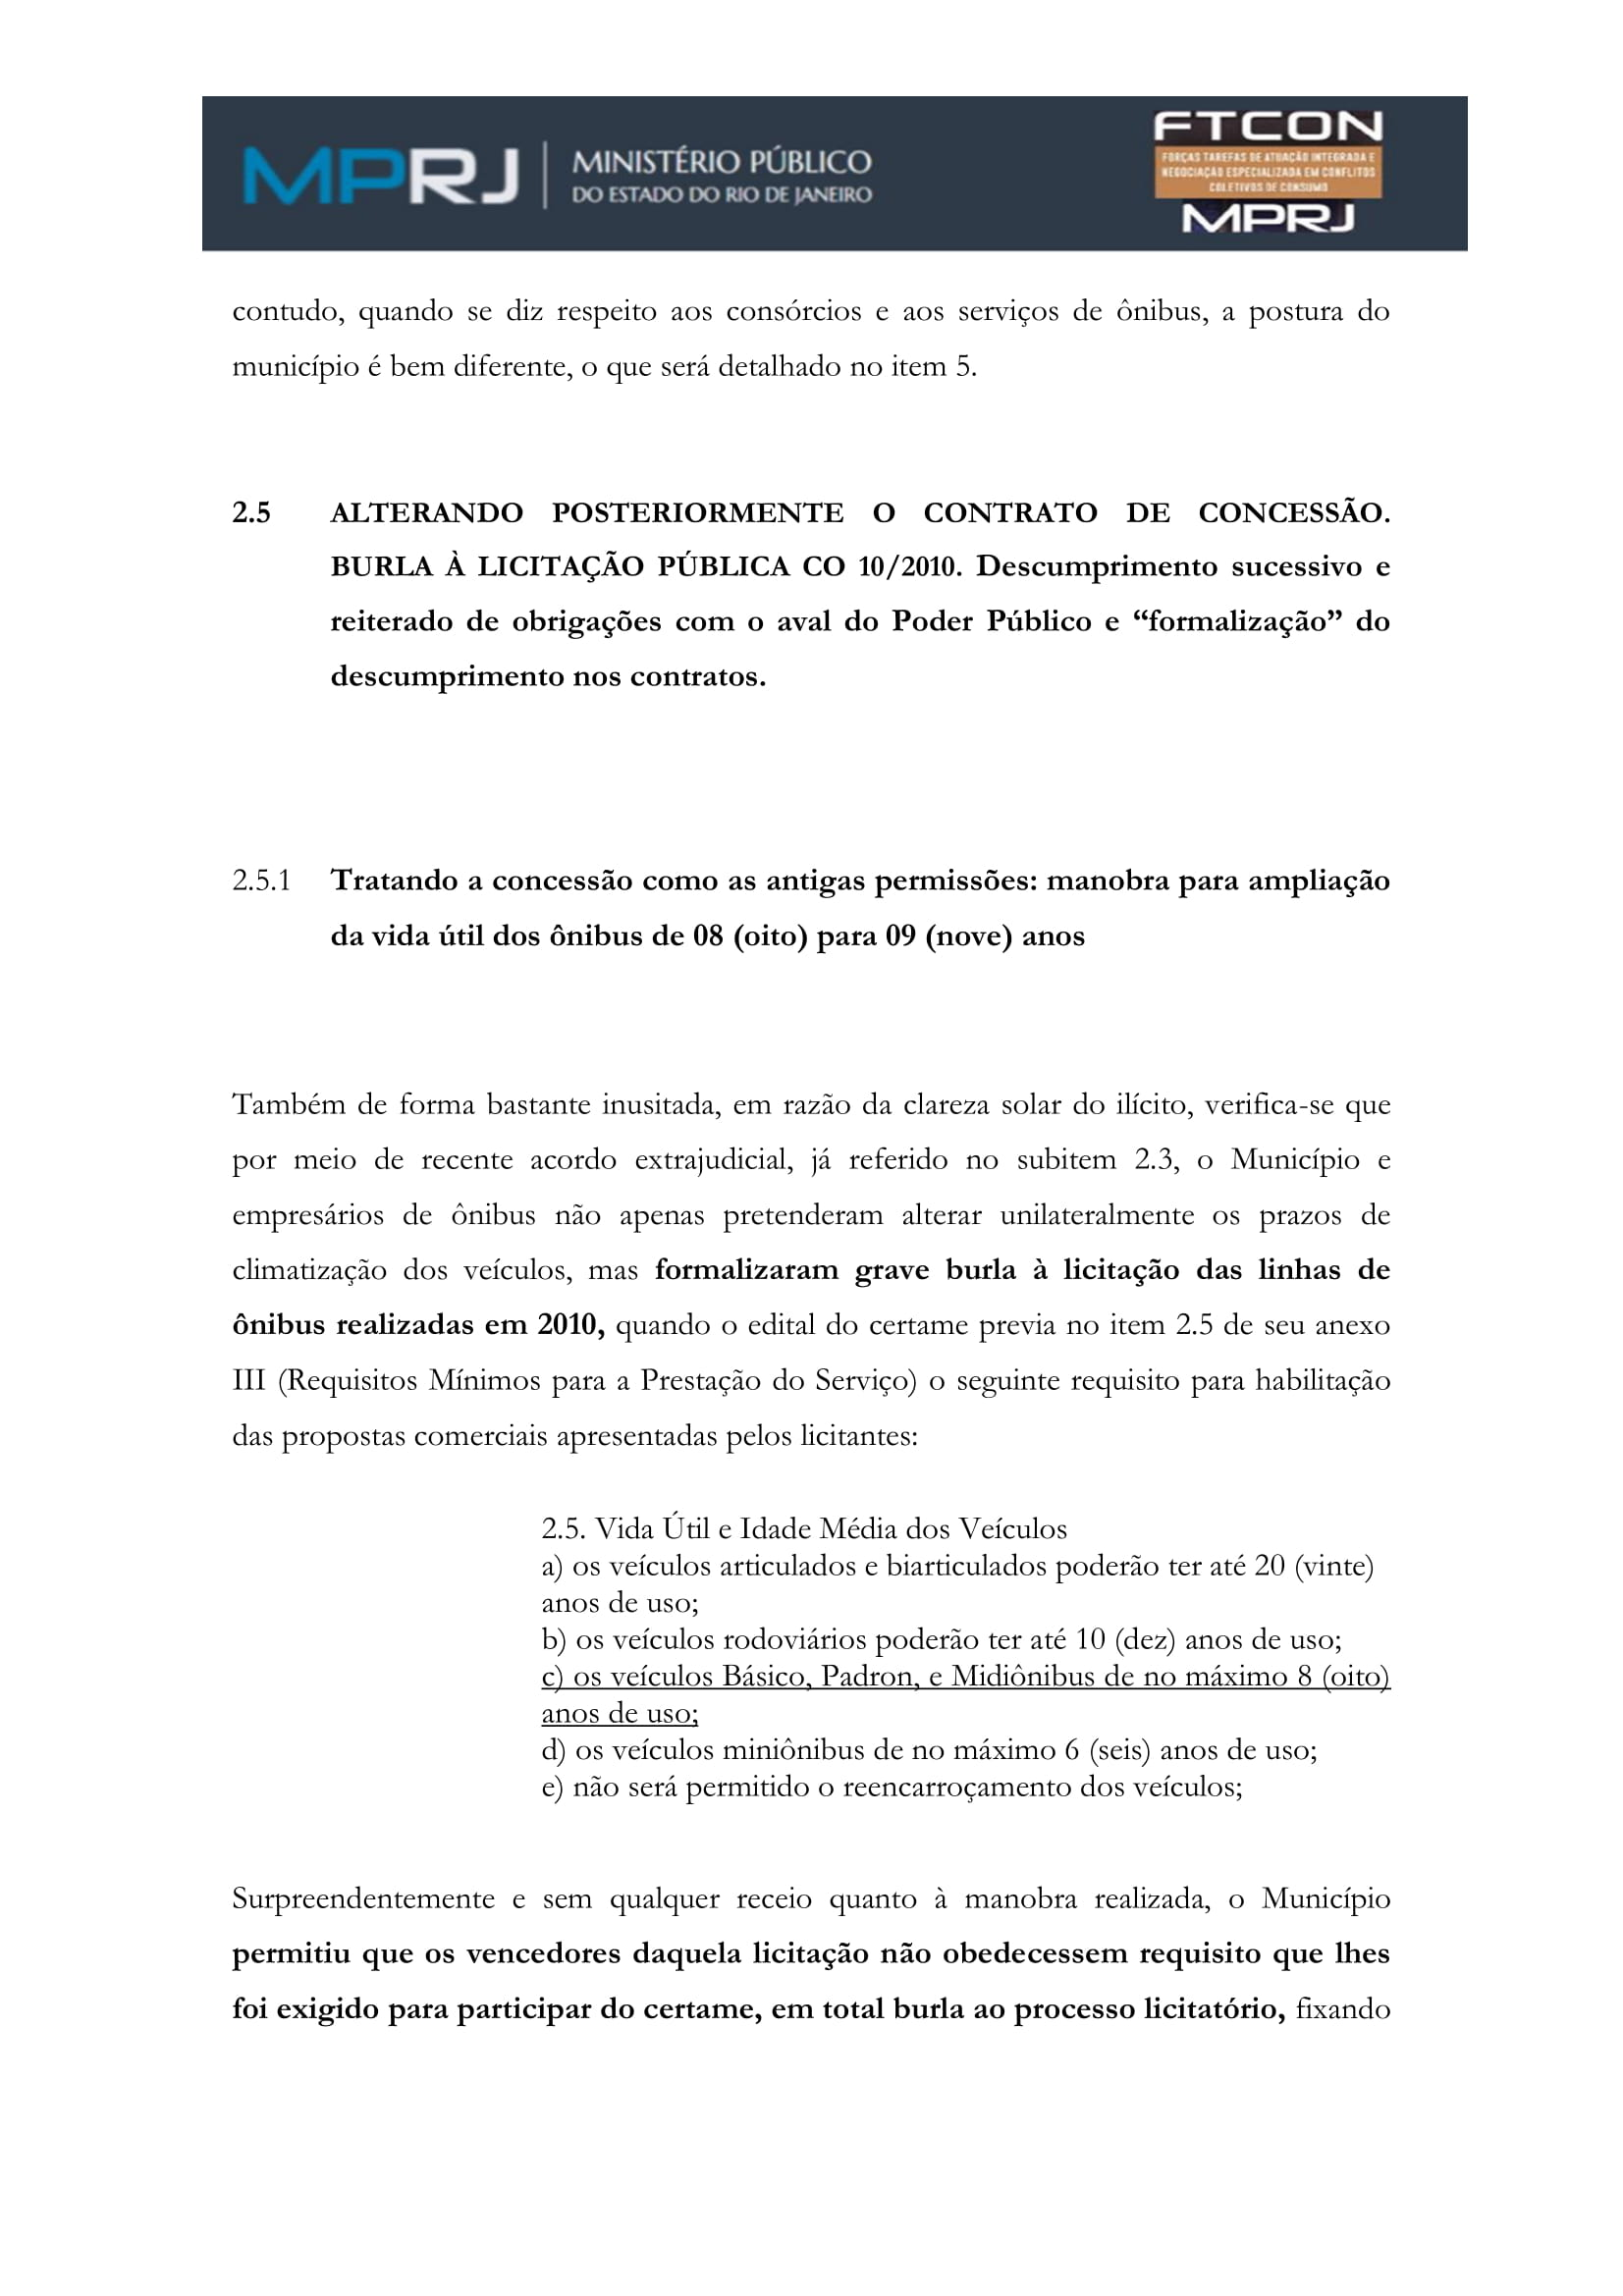 acp_caducidade_onibus_dr_rt-054